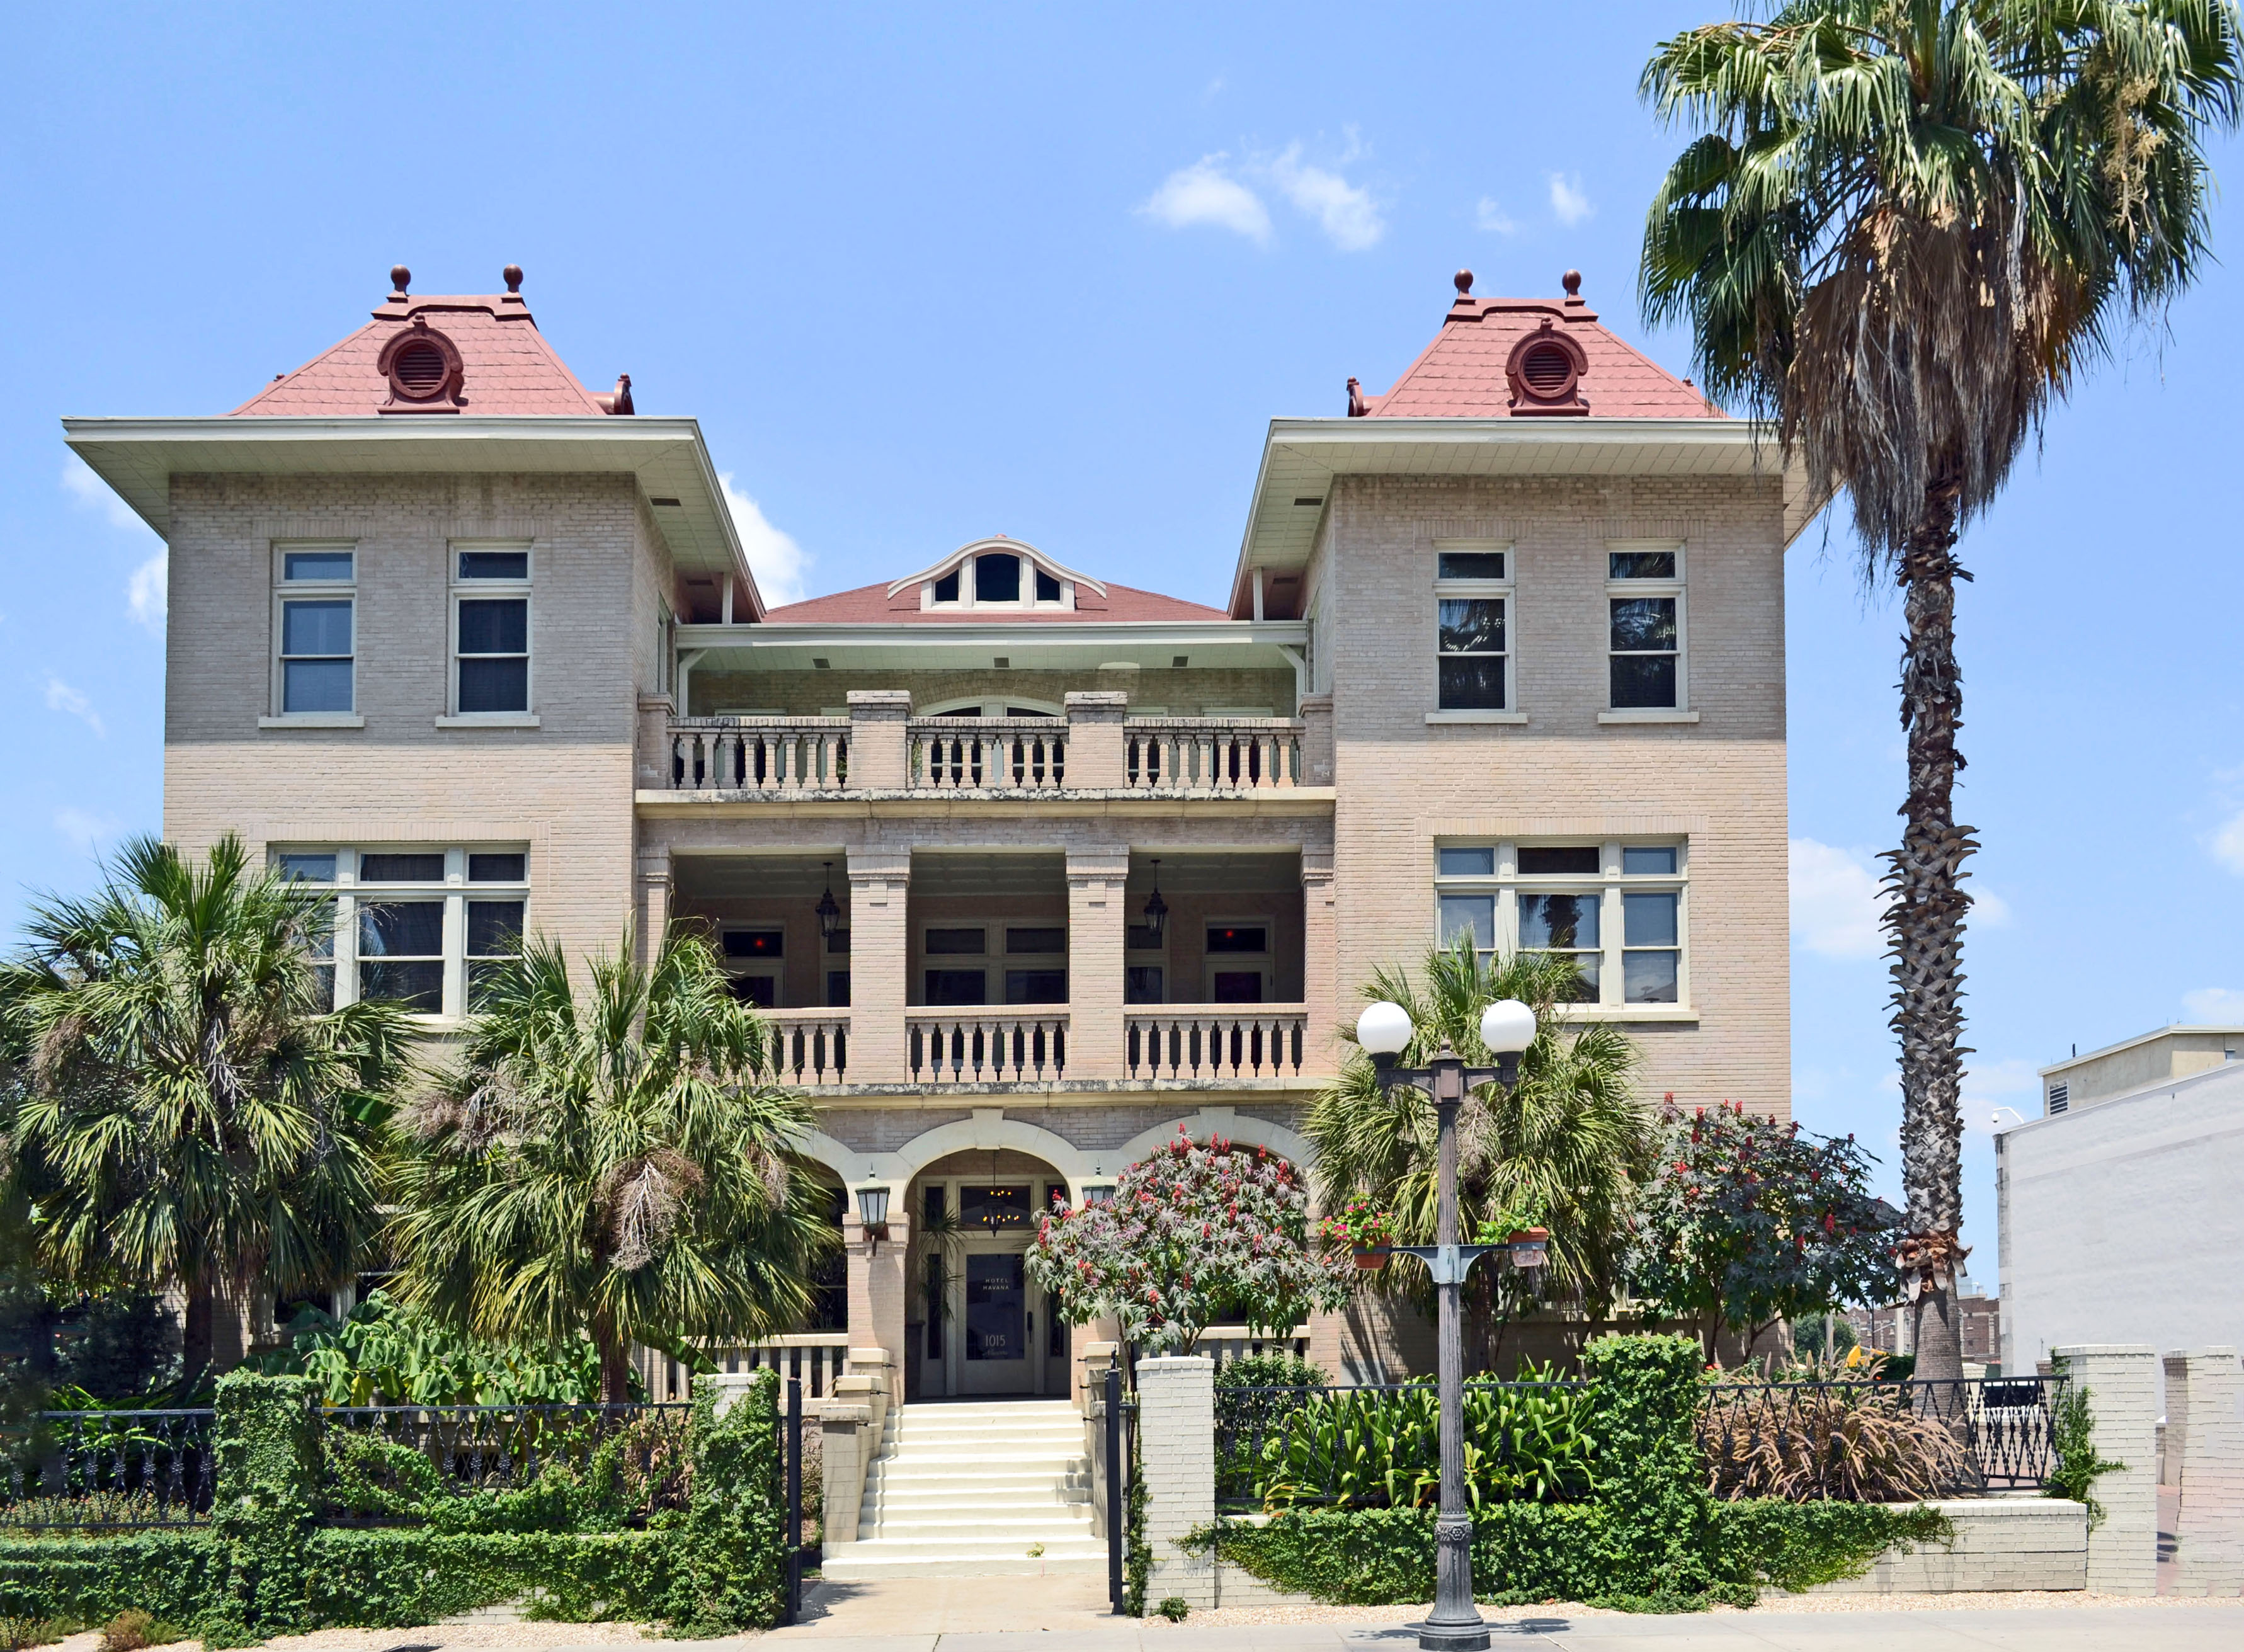 File:The Havana Hotel, San Antonio, Texas.jpg